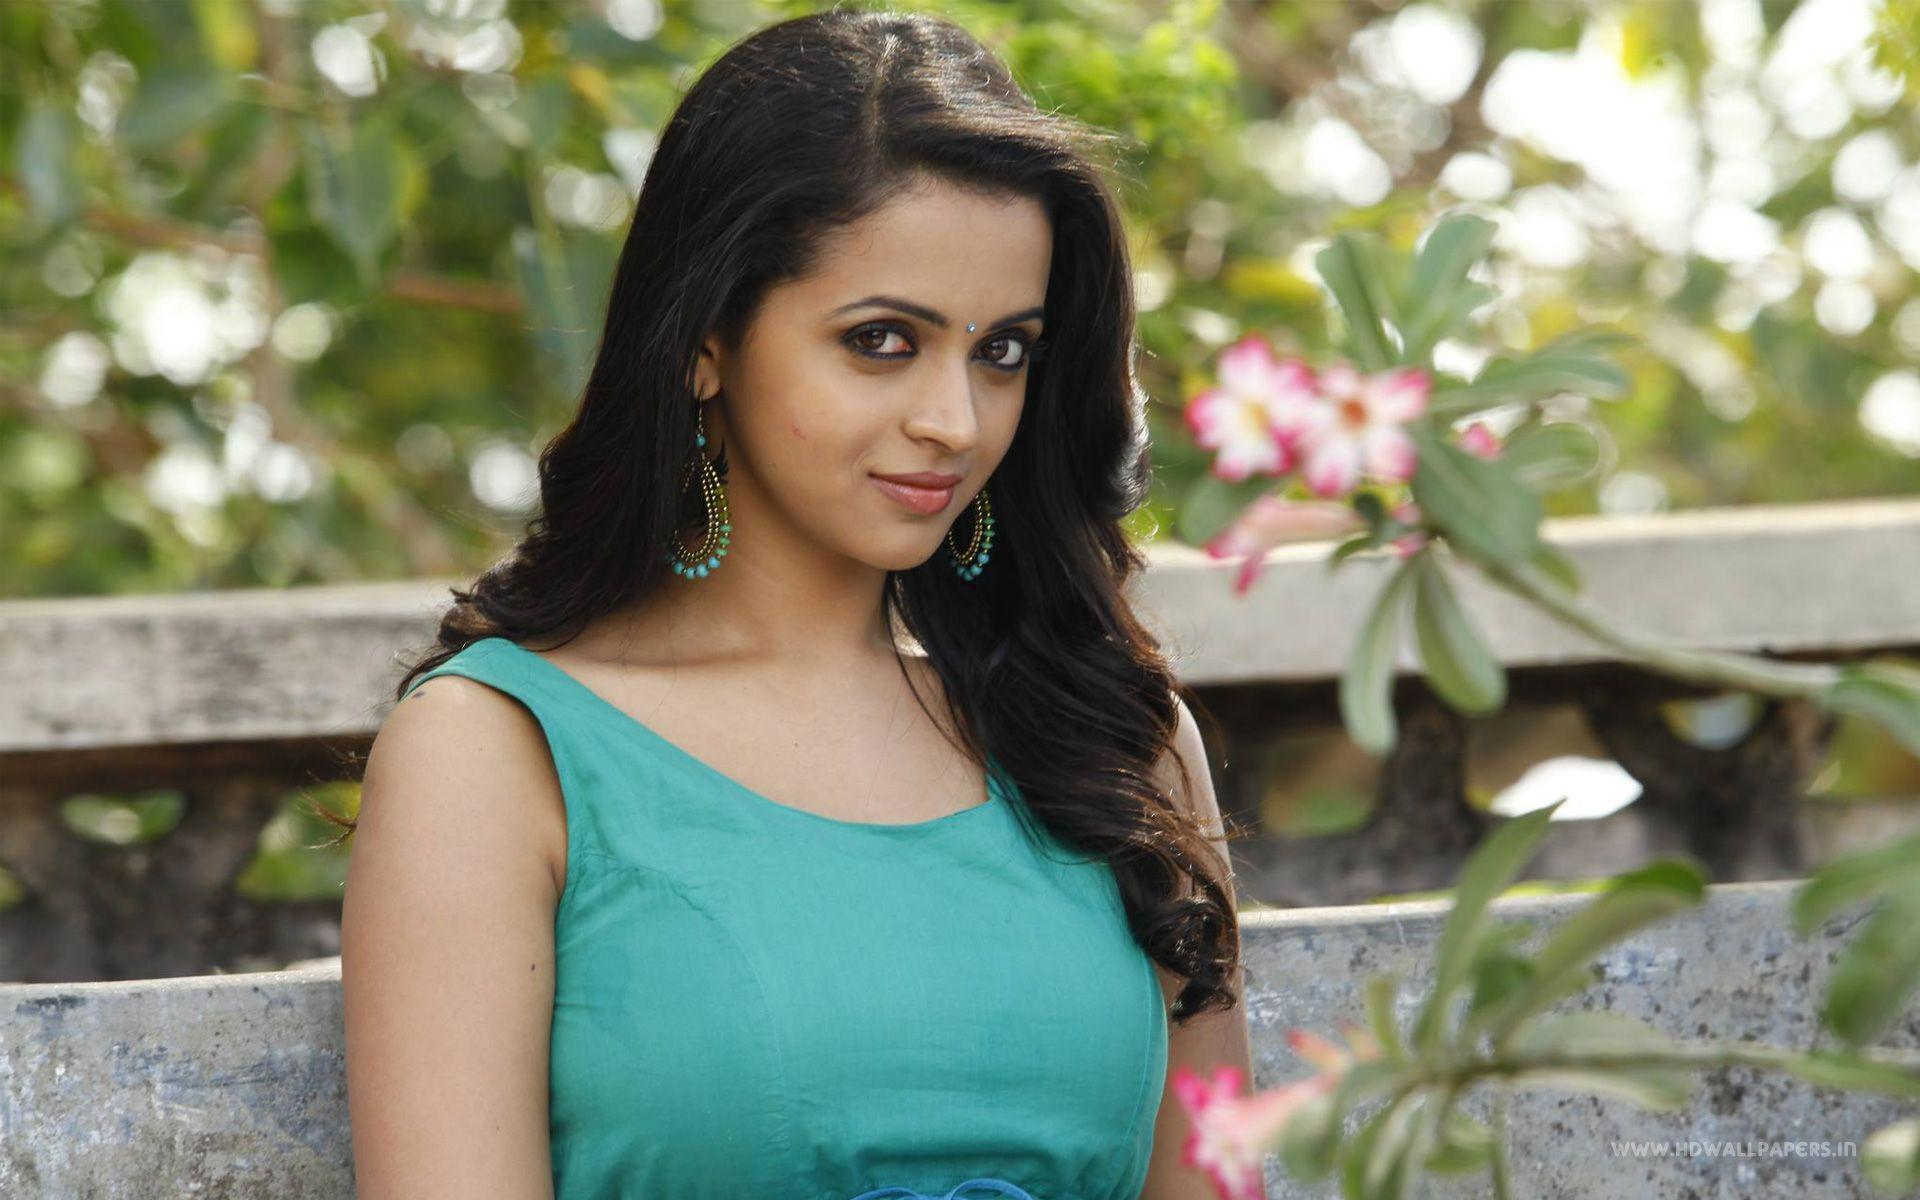 Tamil actress hd wallpapers 1080p wallpaper cave - Tamil heroines hd wallpapers ...